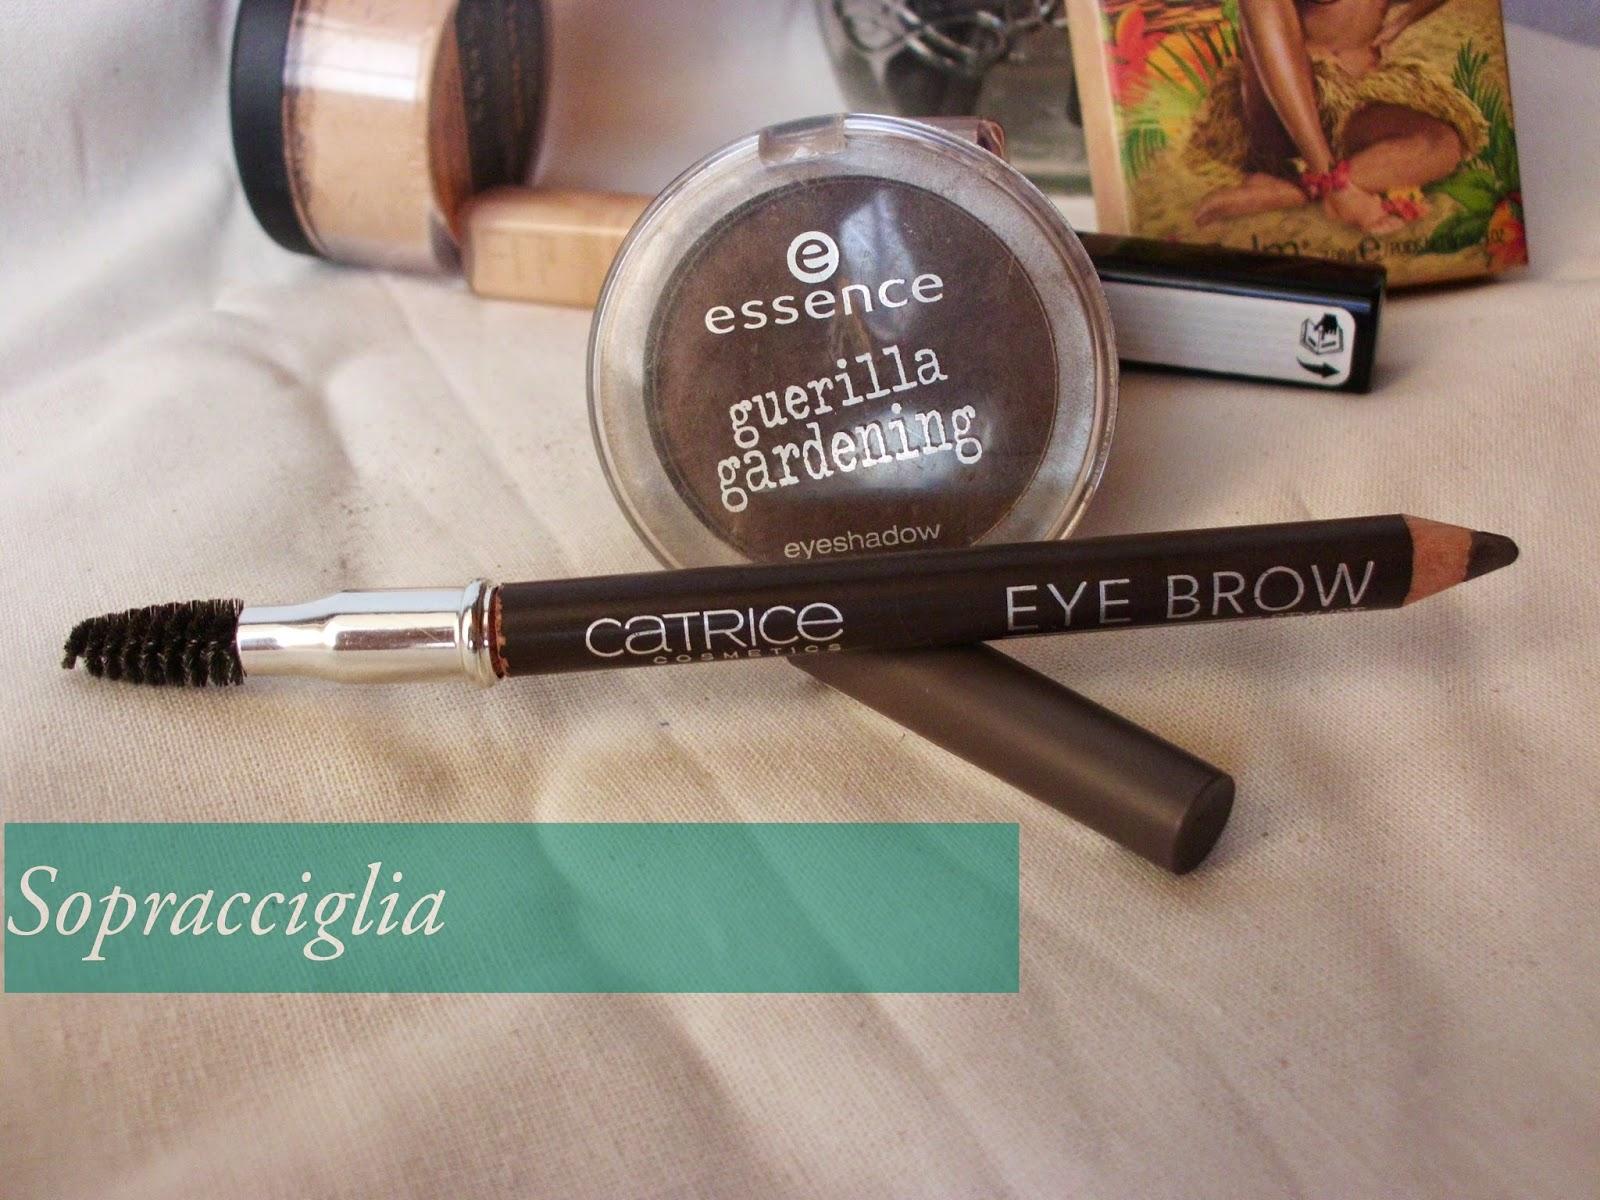 Brow Sopraciglia makeup routine con Brow Stylist Catrice, Guerrila Gardening Essence